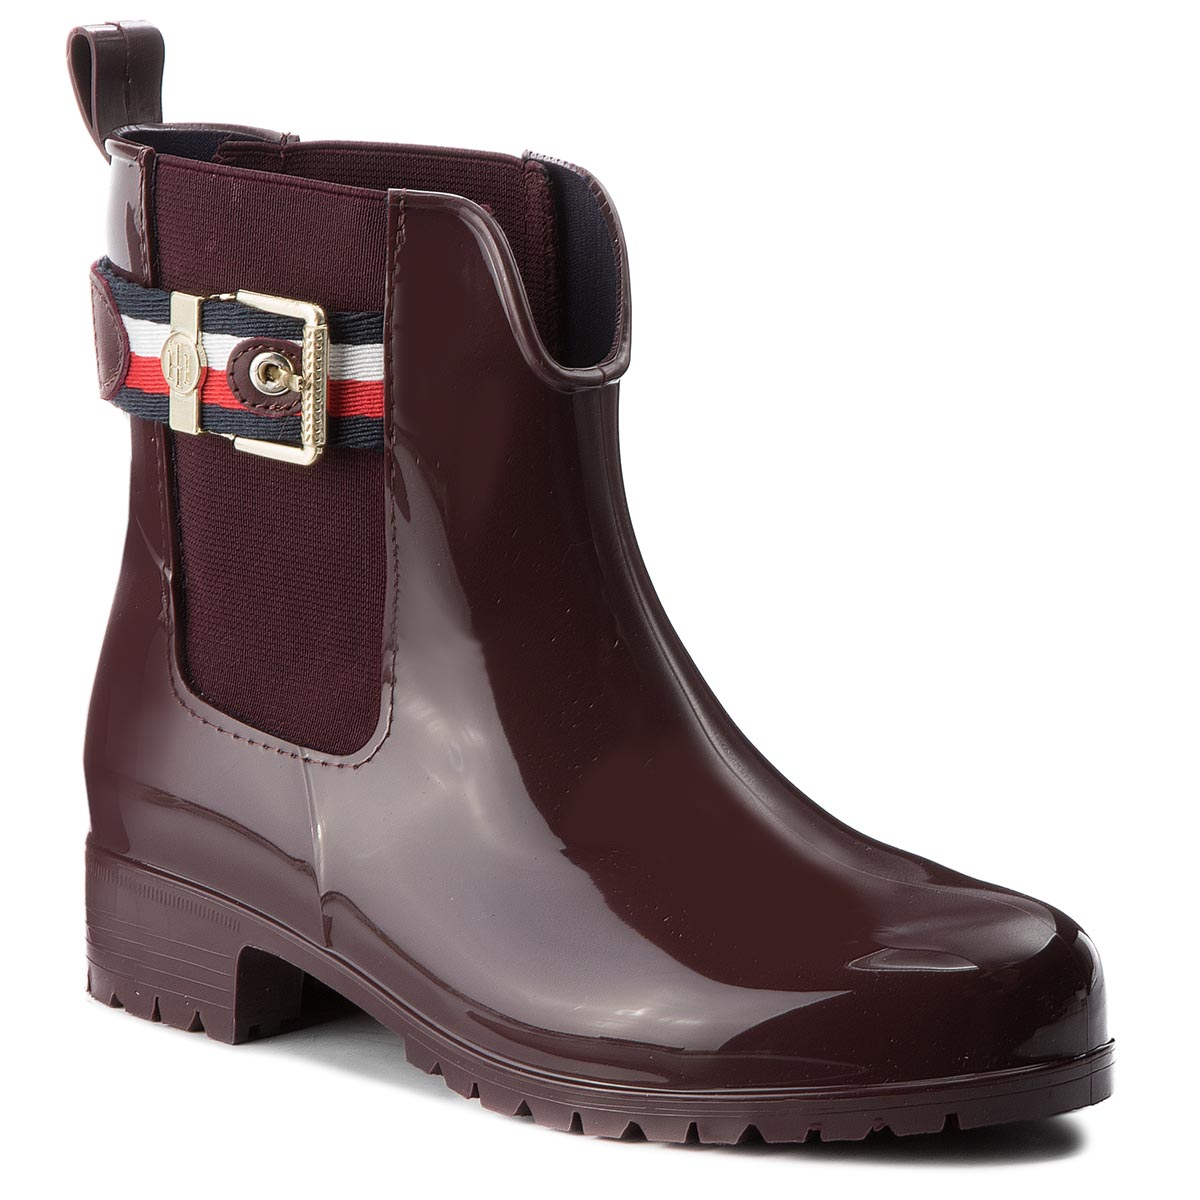 56988ccf520d Wellingtons TOMMY HILFIGER Corporate Belt Rain FW0FW03329 Decadent  Chocolate 296